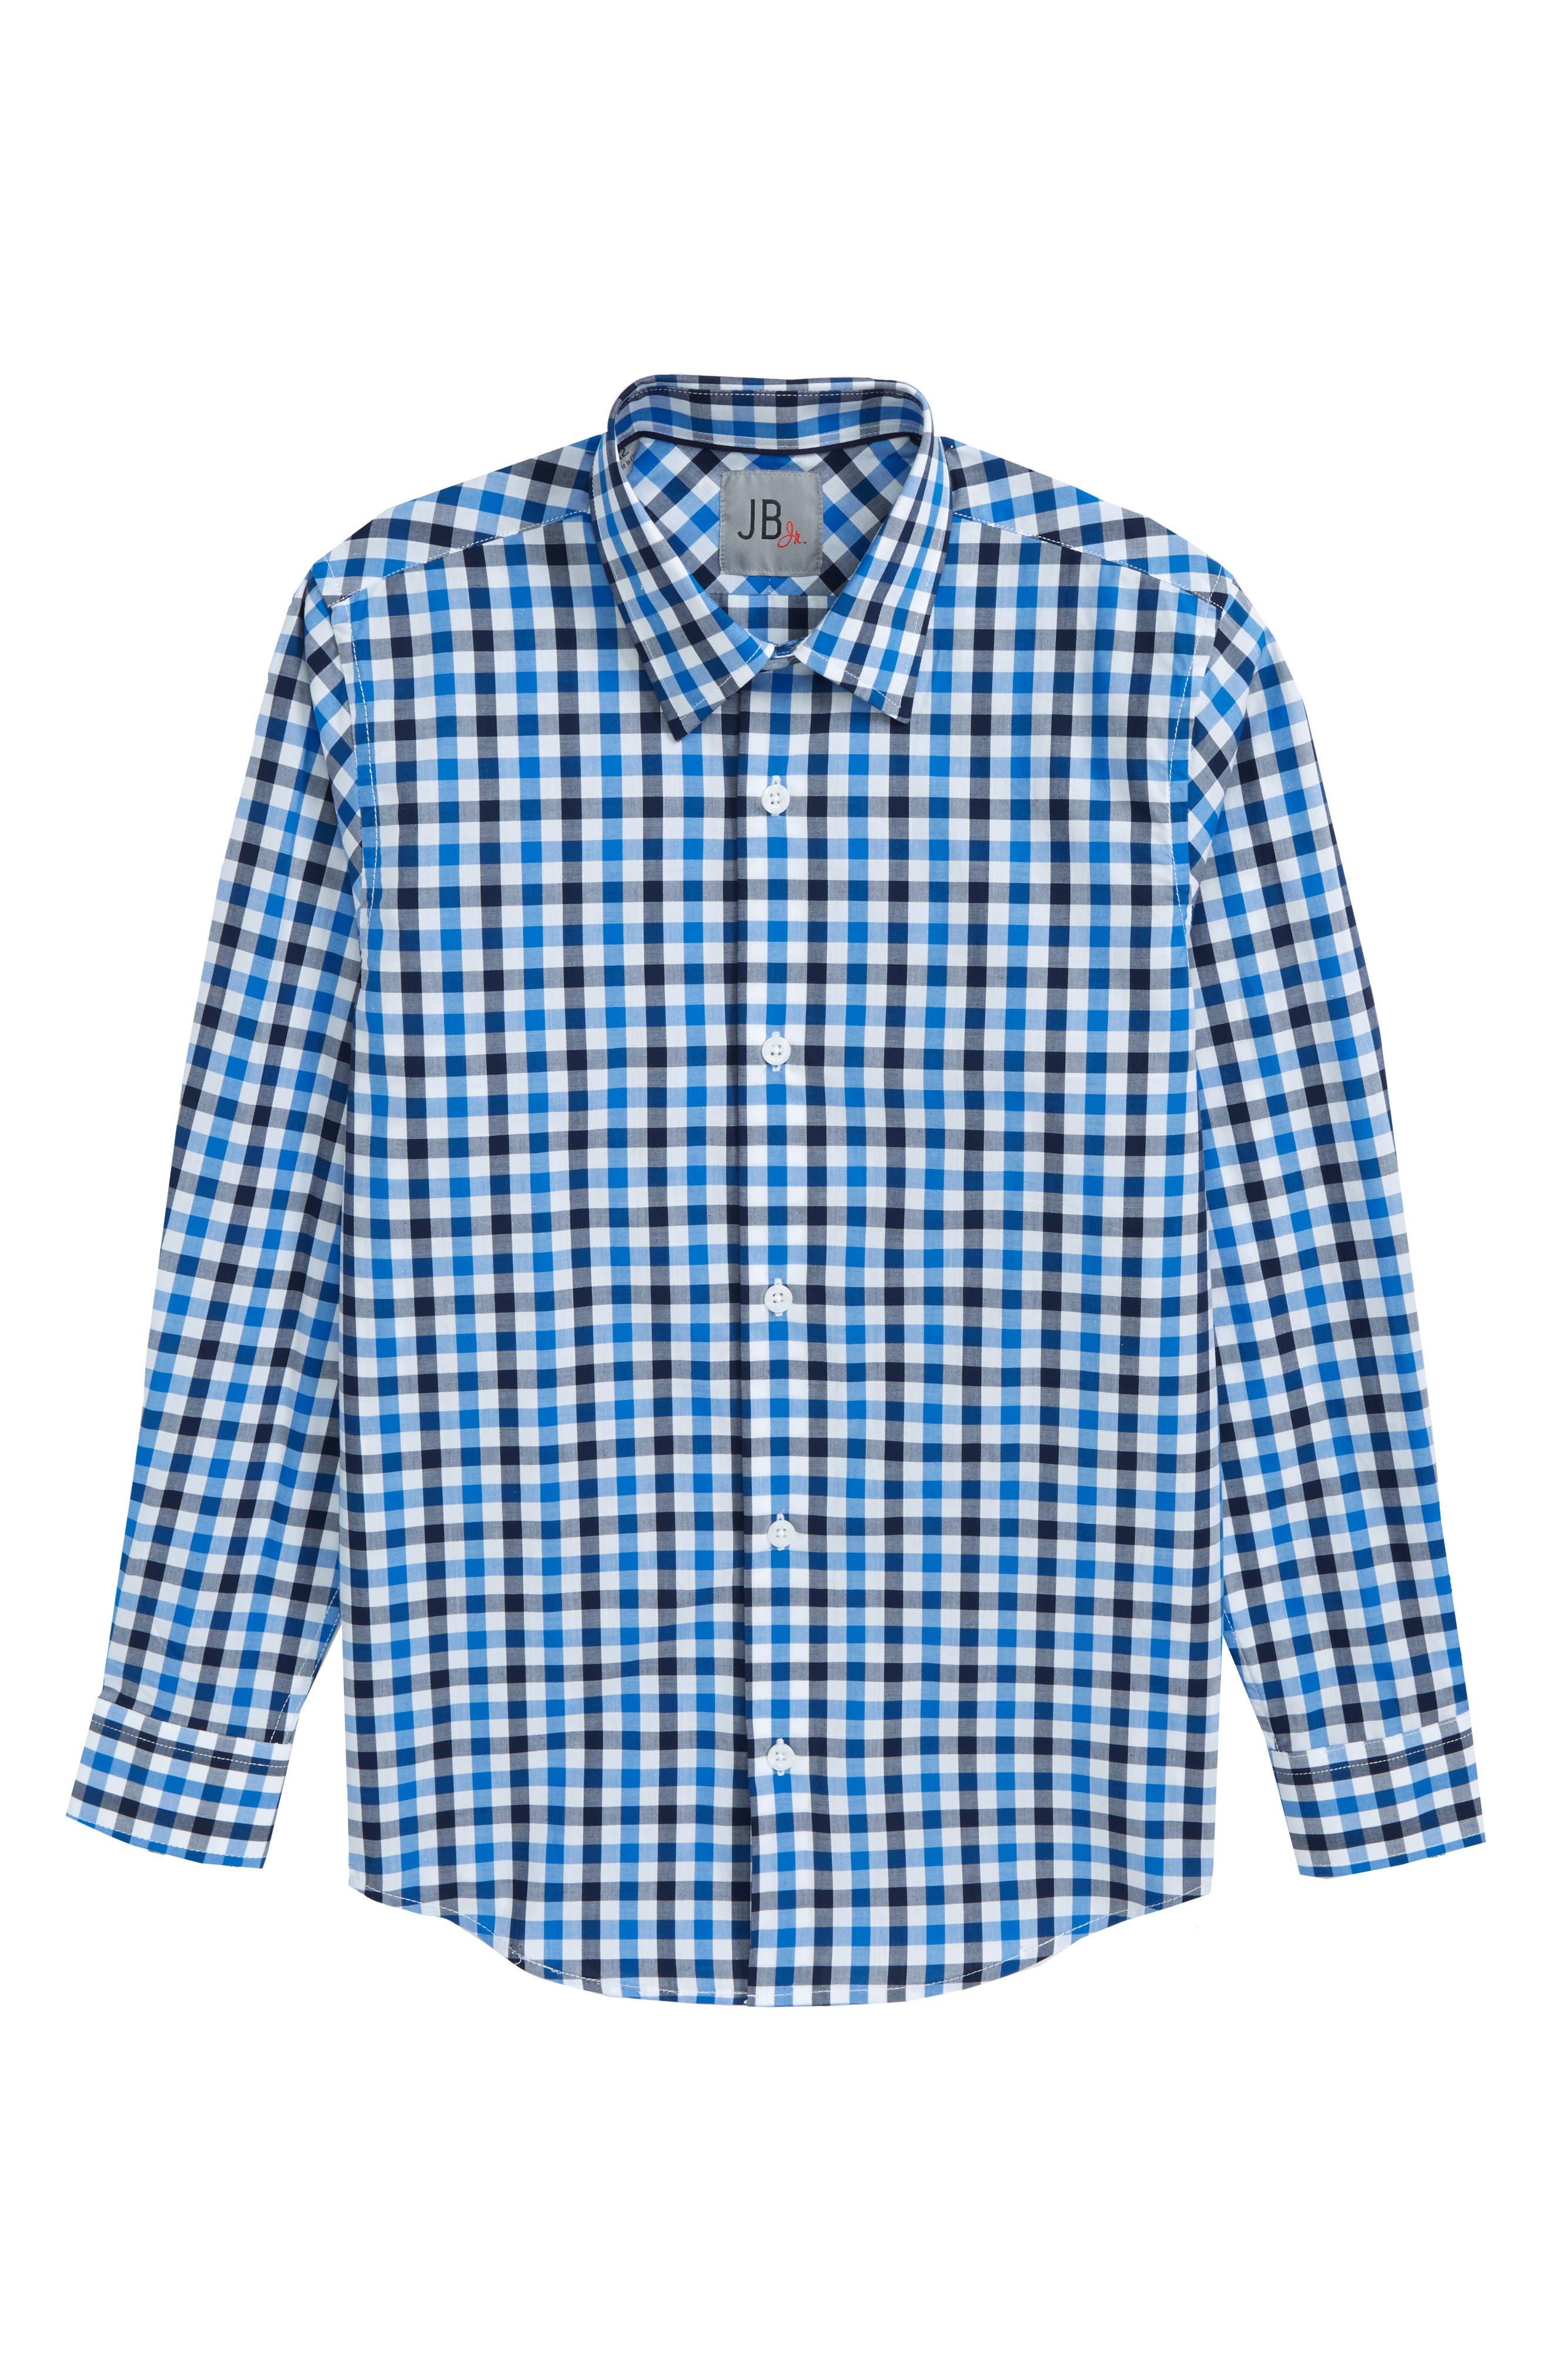 JB JR,                             Check Dress Shirt,                             Main thumbnail 1, color,                             422